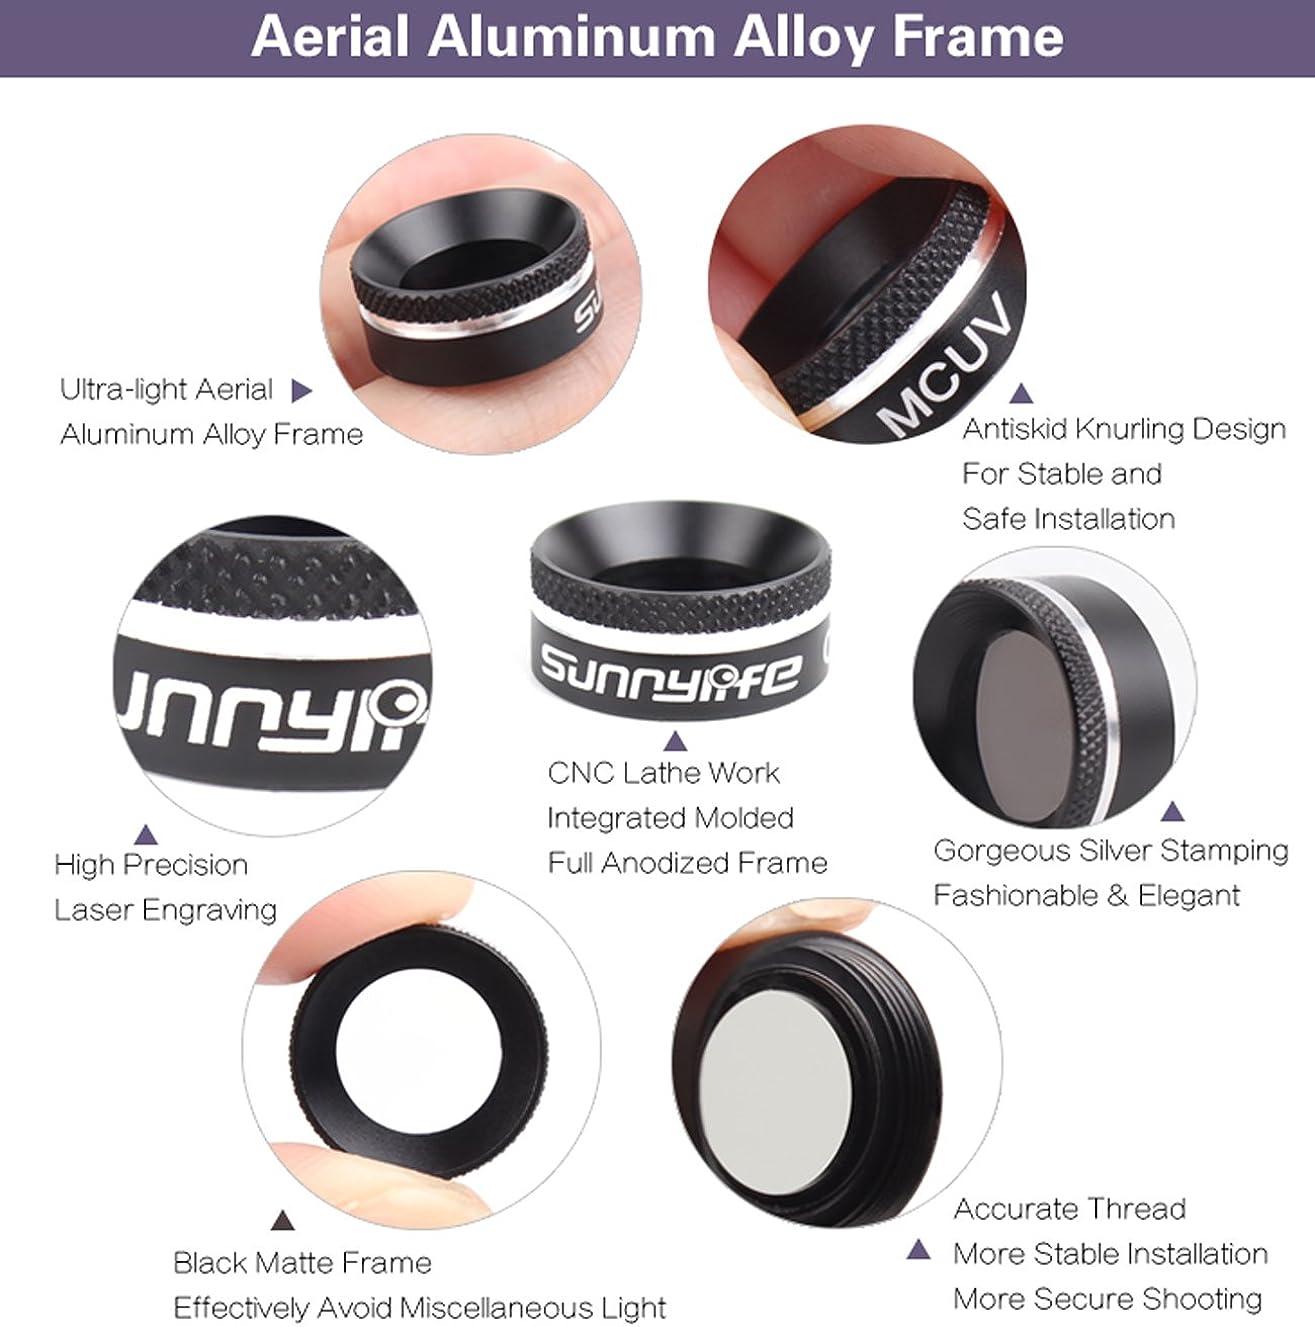 CZFRIEND Camera Lens Filter Set Accessories Hood Lens Protection for DJI MAVIC AIR Drone Quadcopter